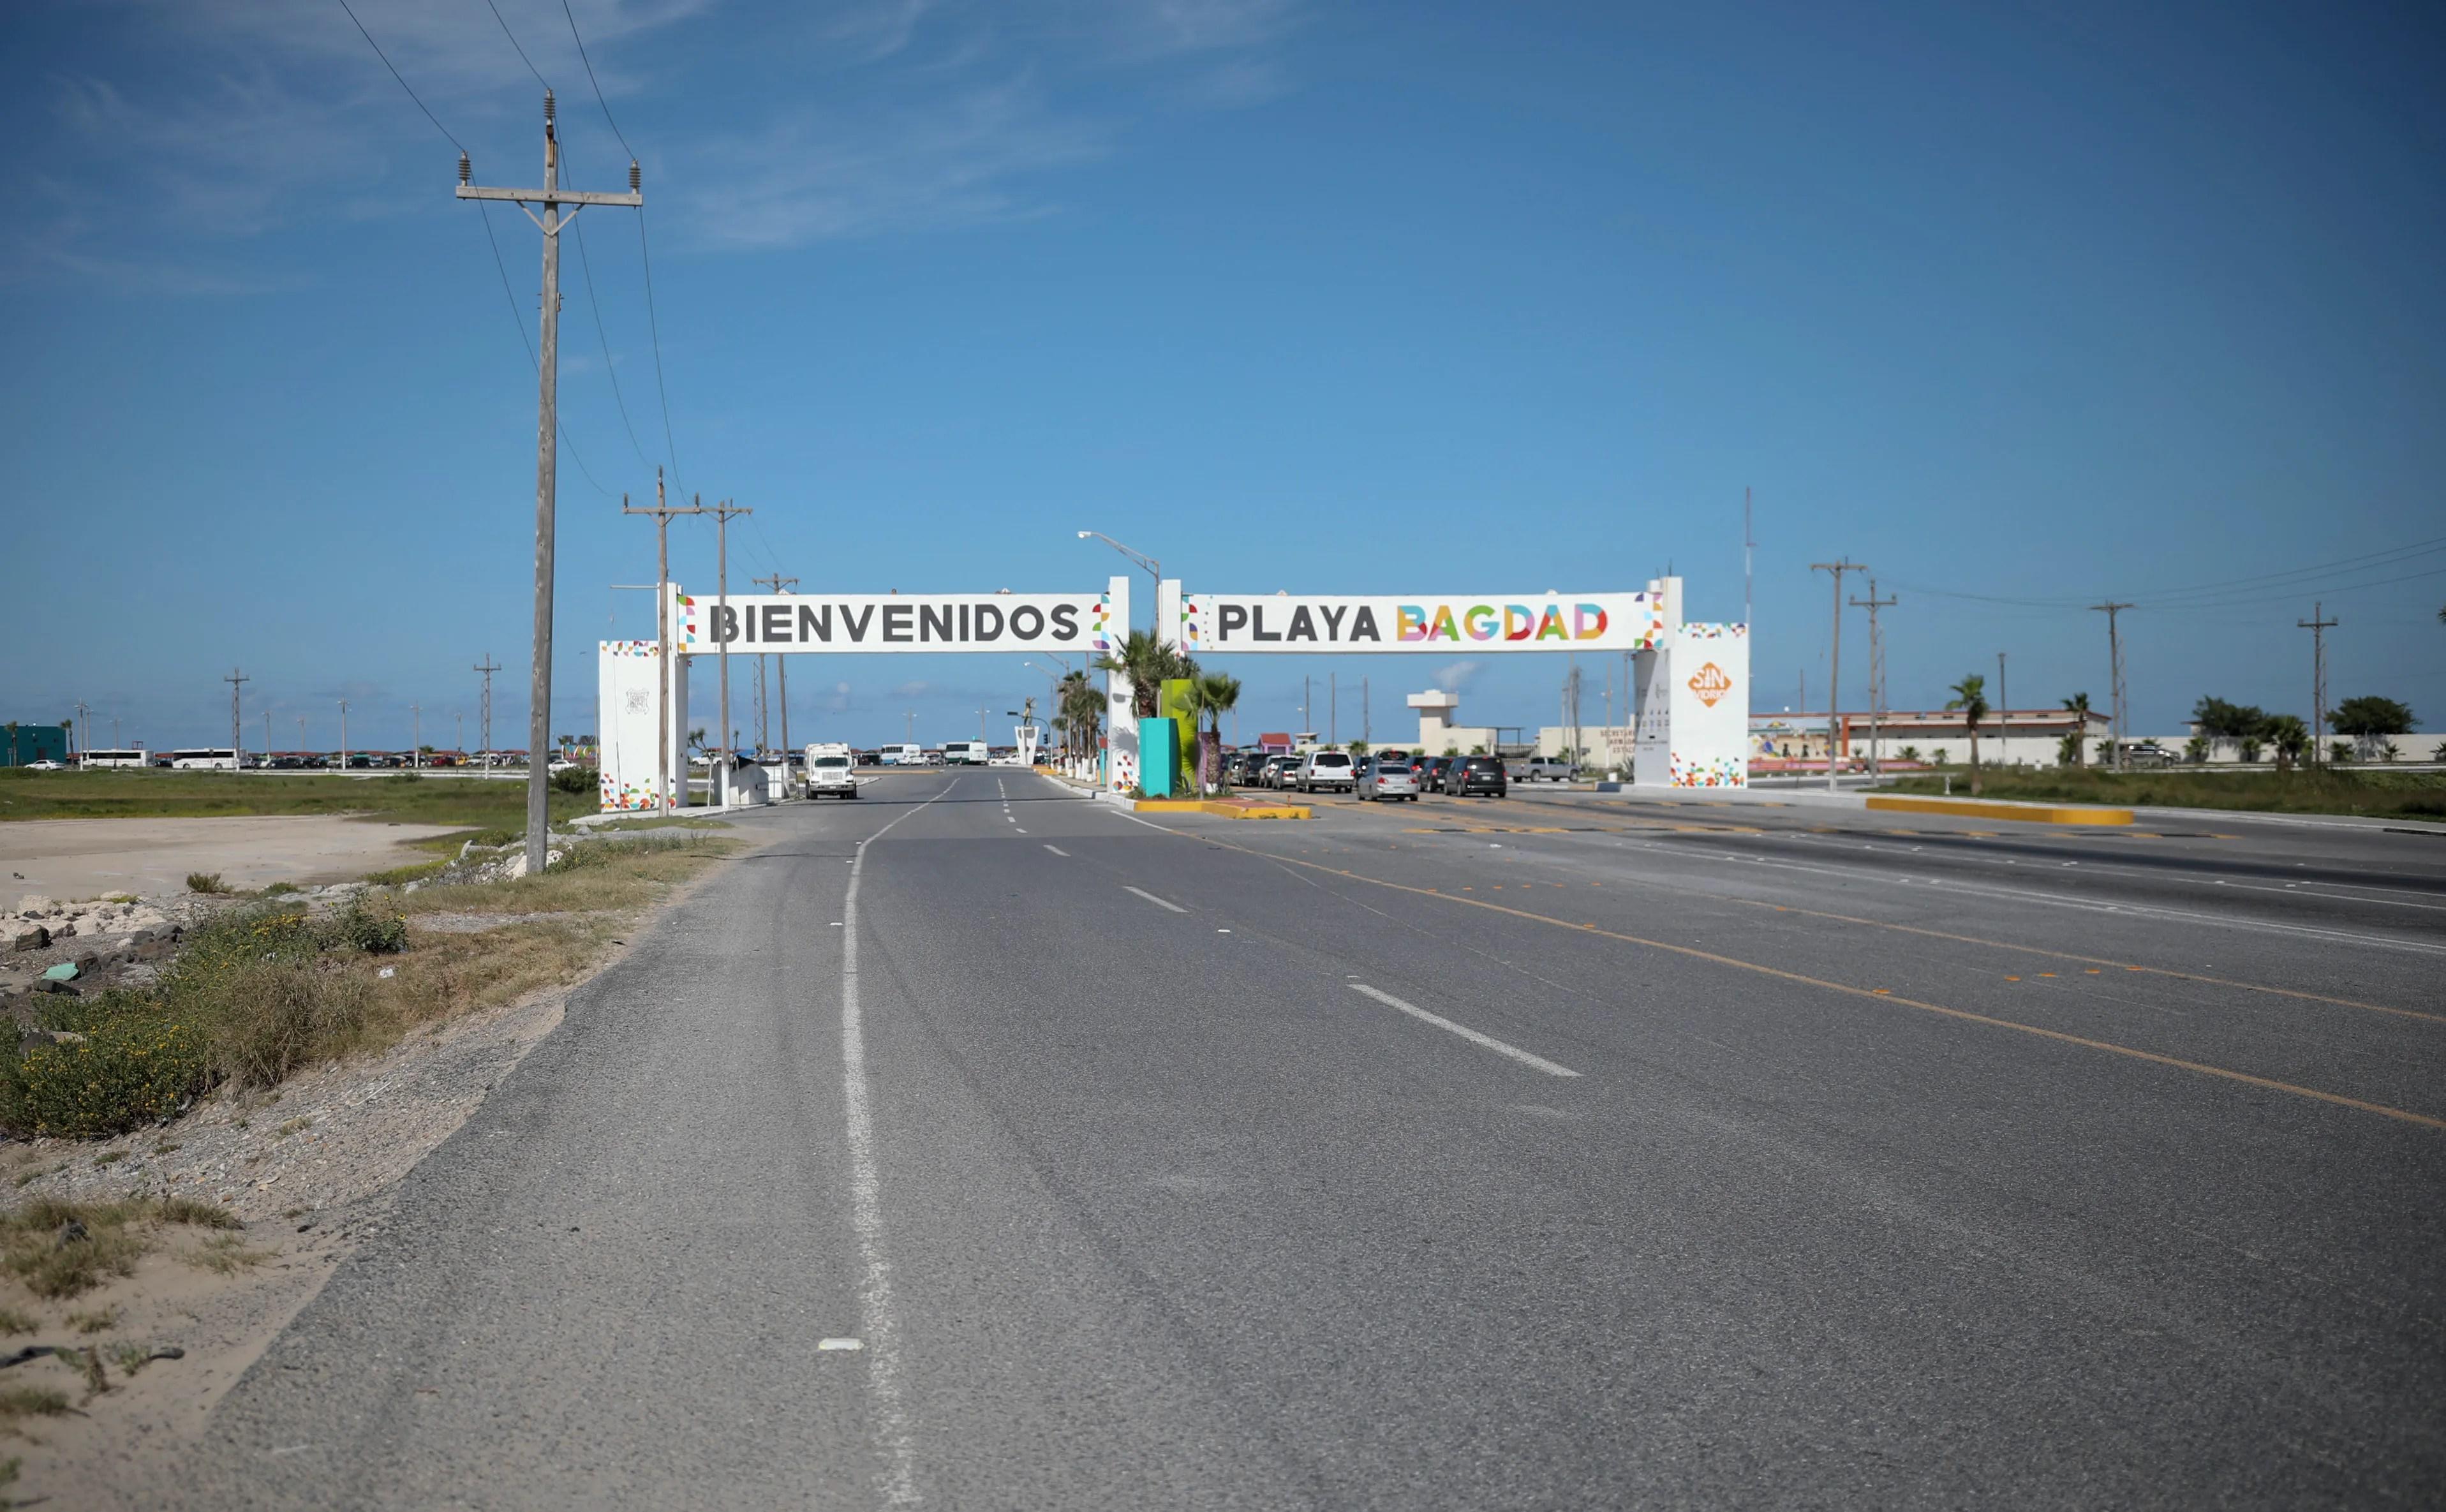 playa bagdad us mexico